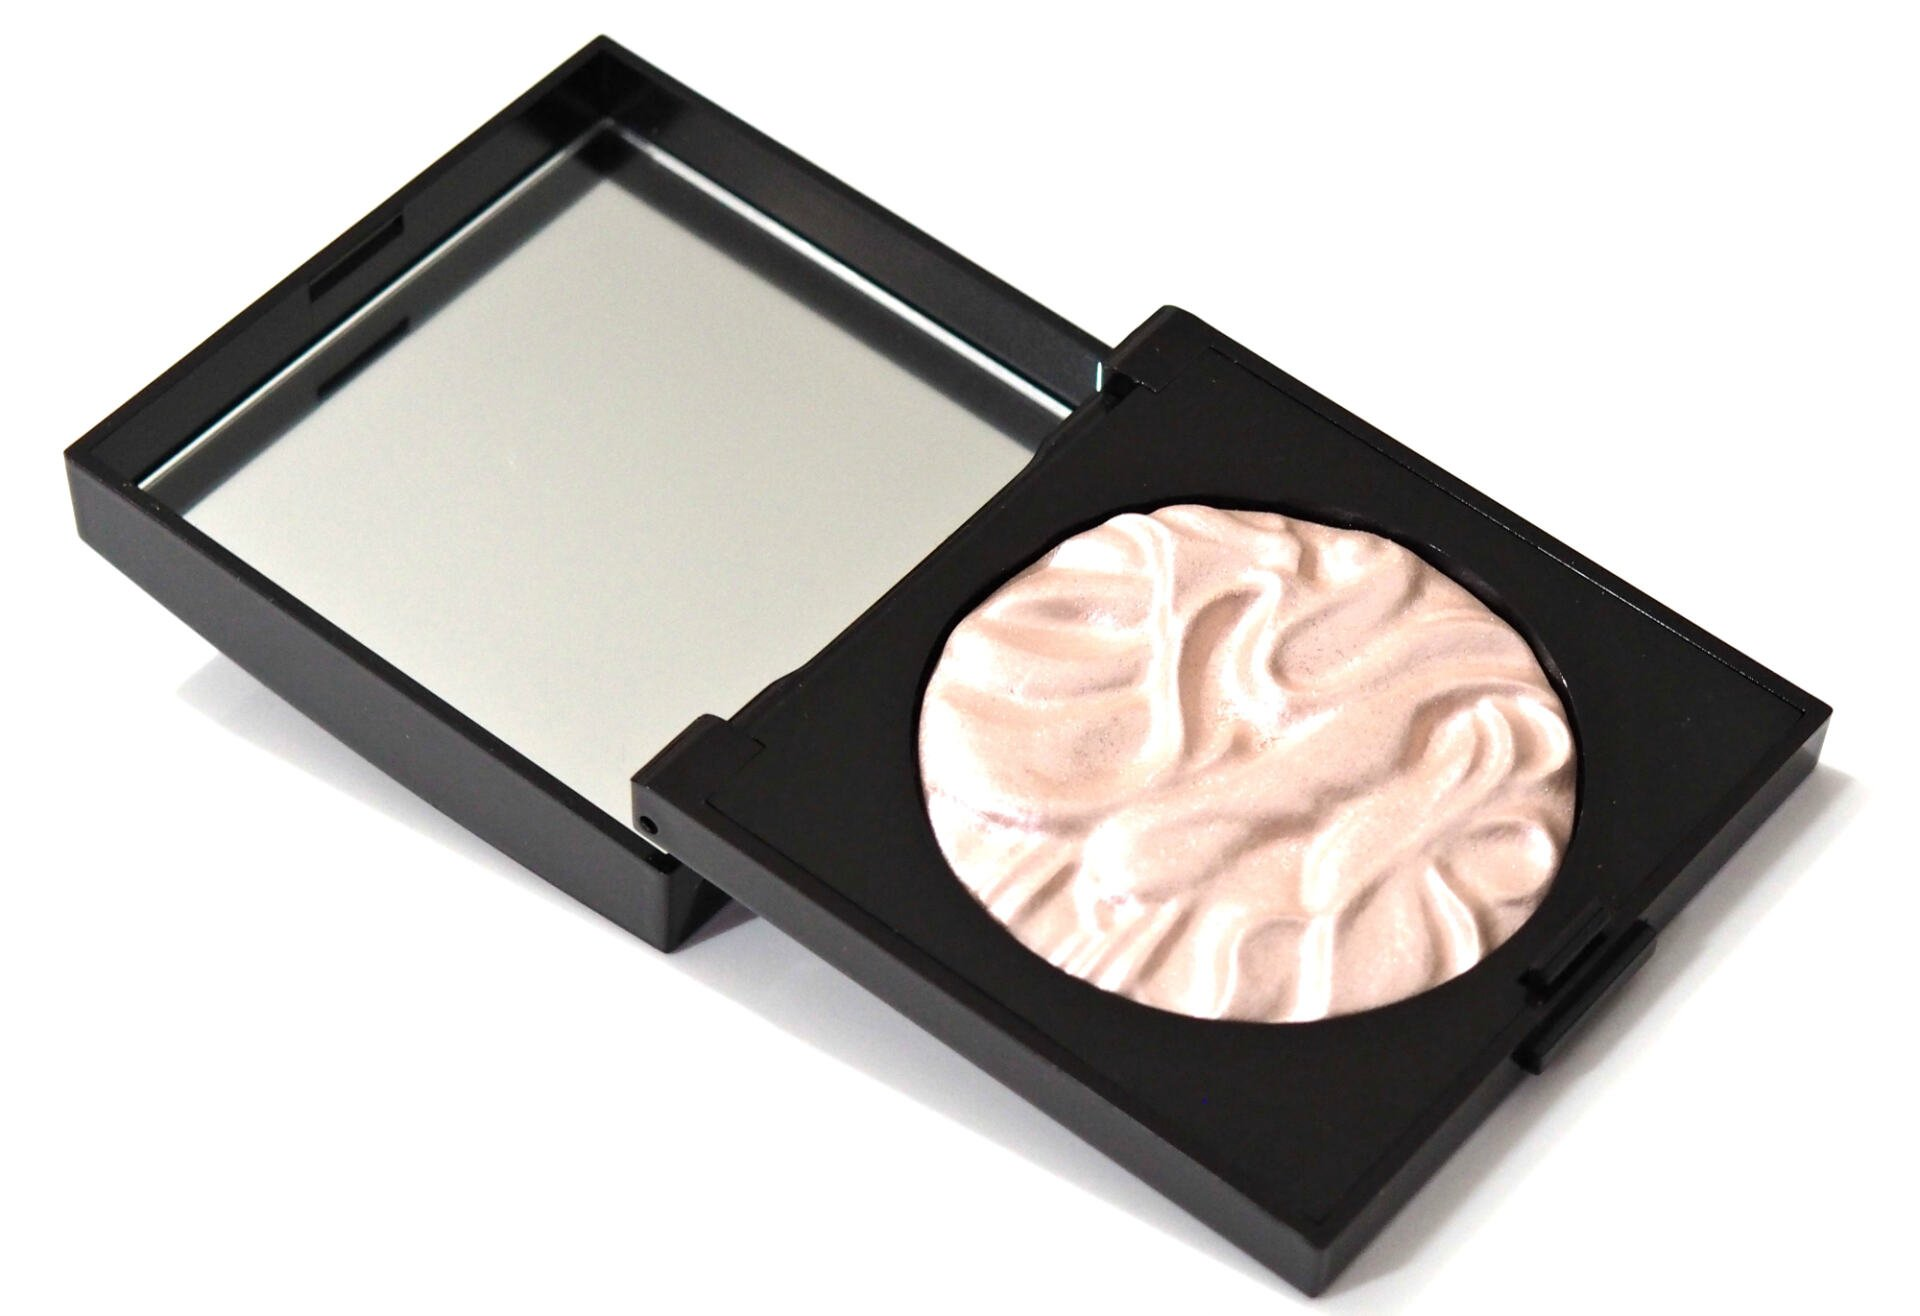 Laura Mercier Face Illuminator Powder Review / Swatches